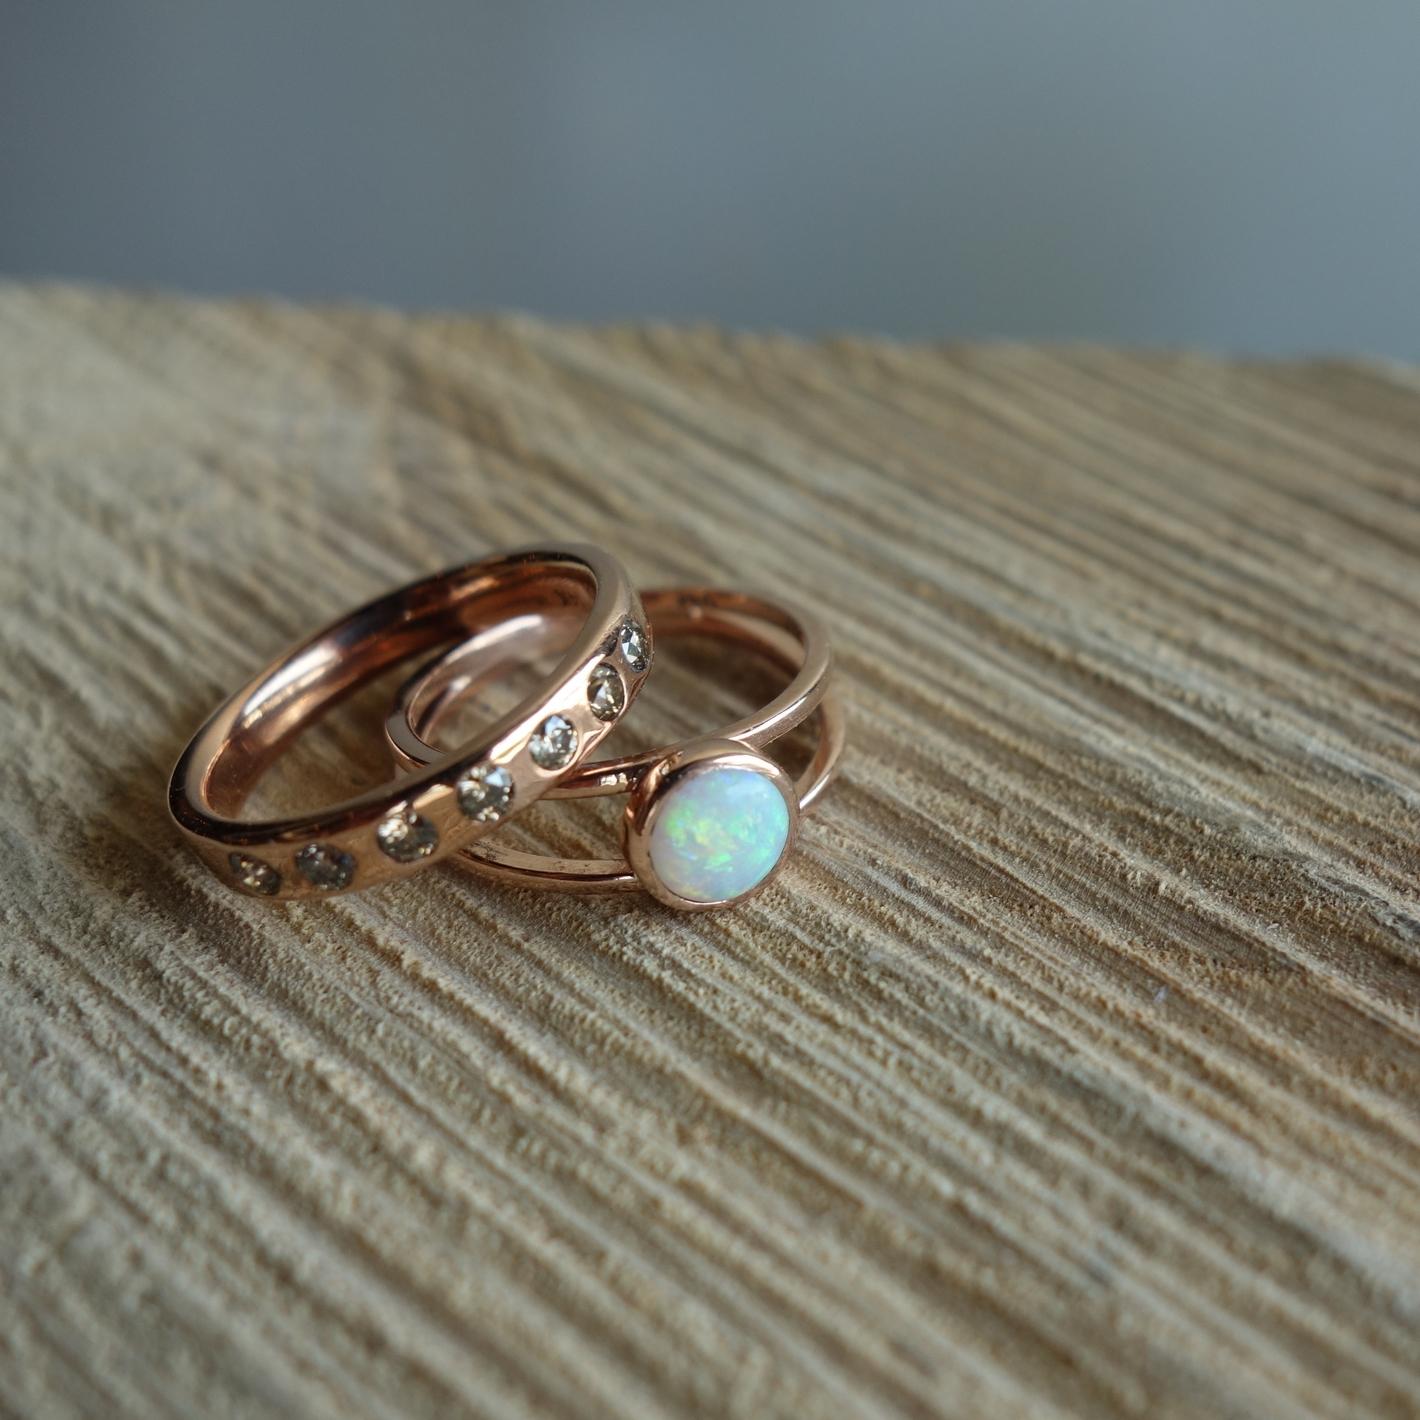 Opal, Cognac Diamonds, Rose Gold Wedding set - MeritMade